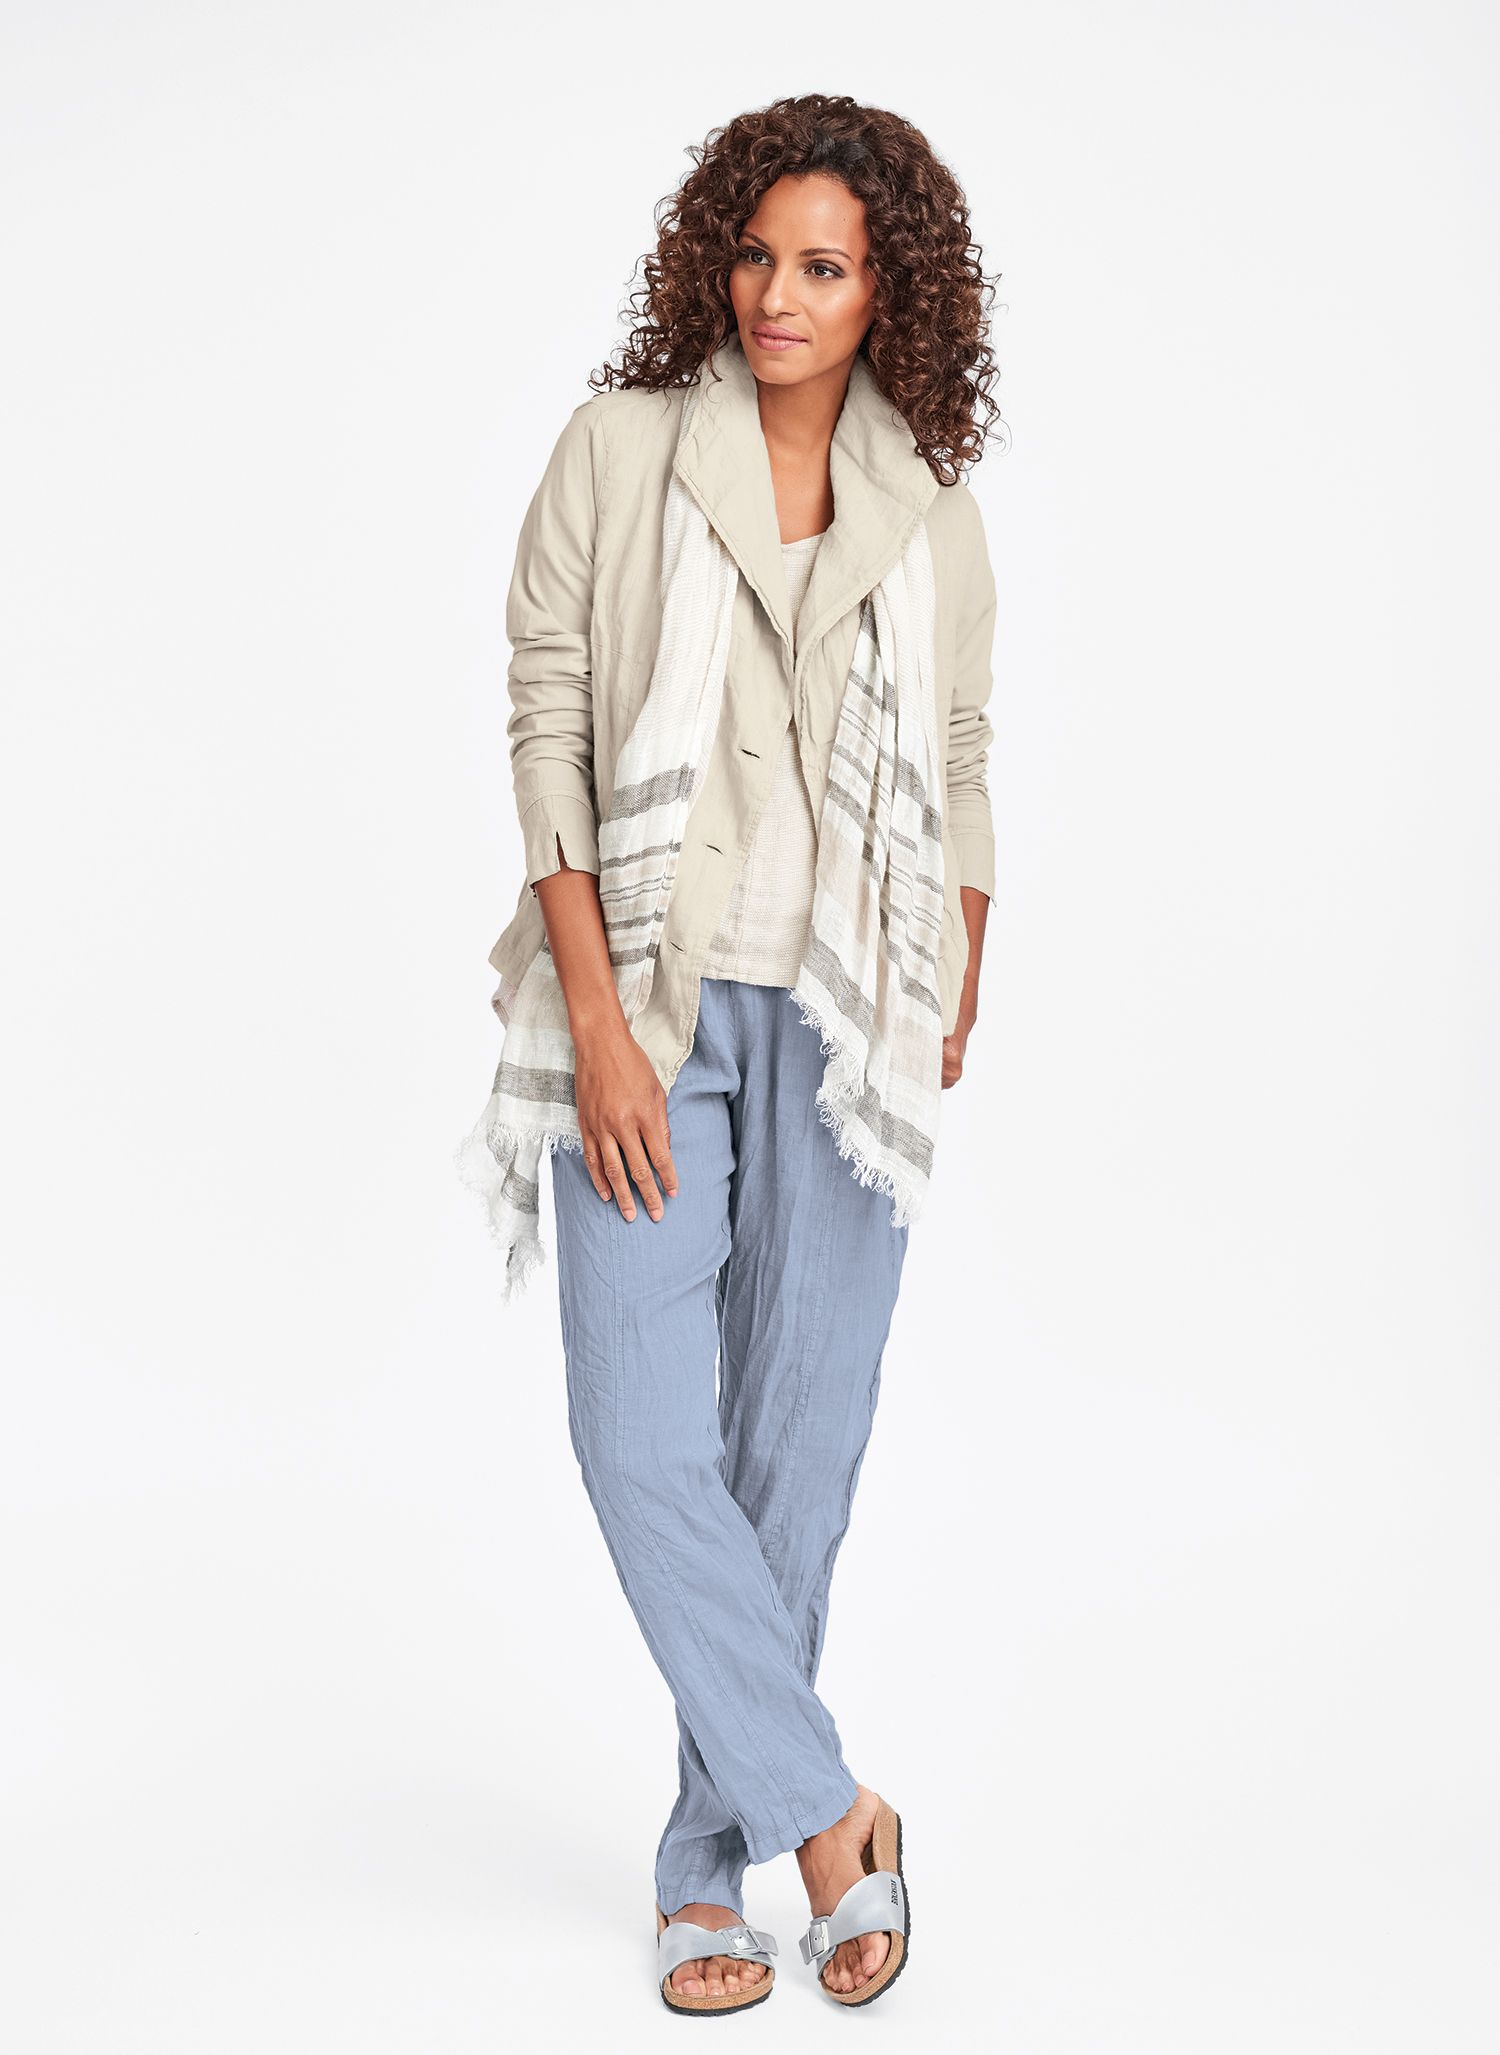 Urban FLAX 2019 Womens linen clothing, Linen clothes